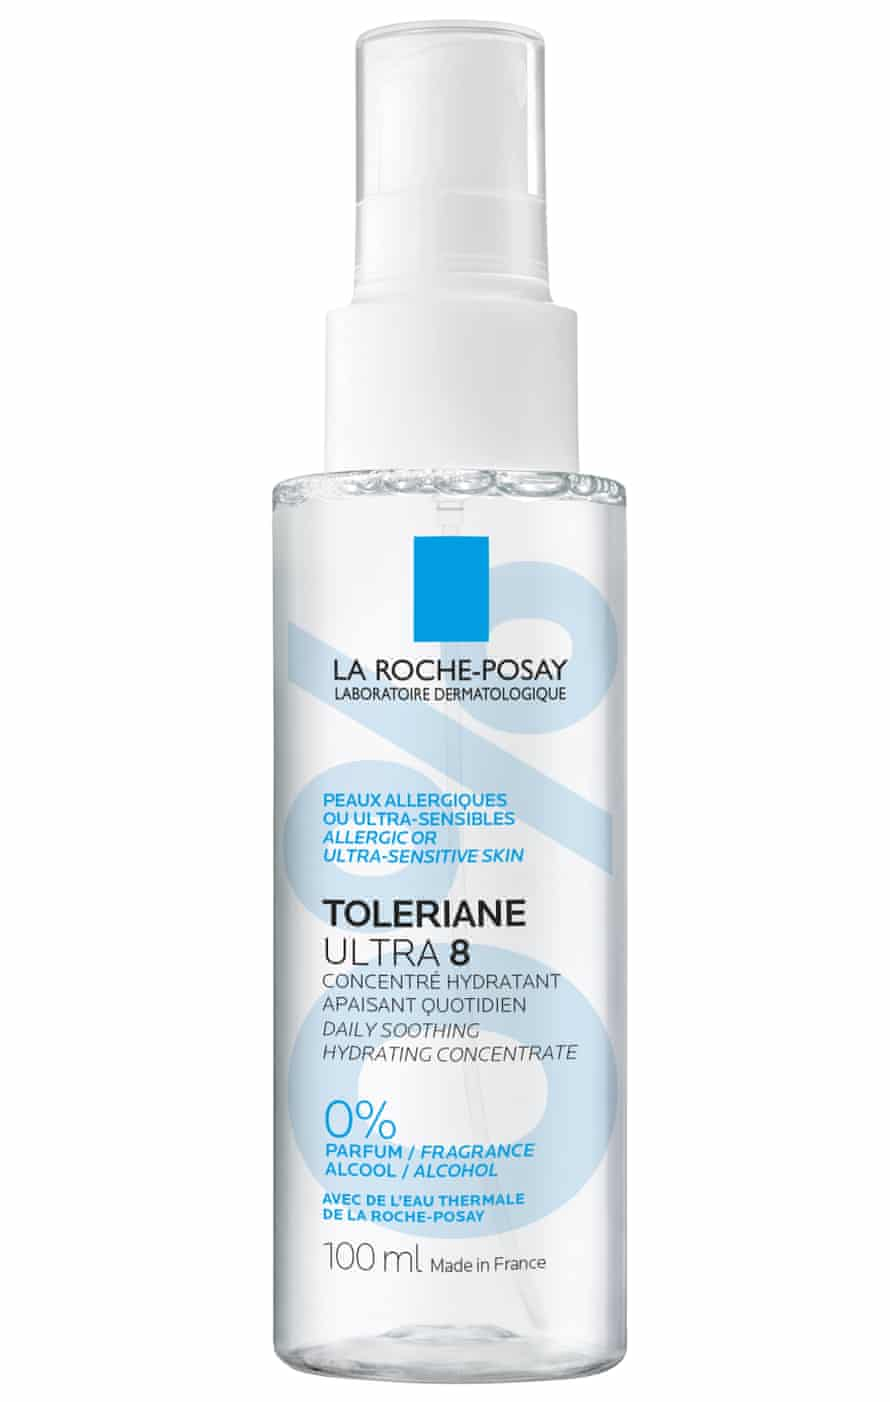 LA ROCHE POSAY Toleriane Ultra 8 100 ml product packshot HD (1)